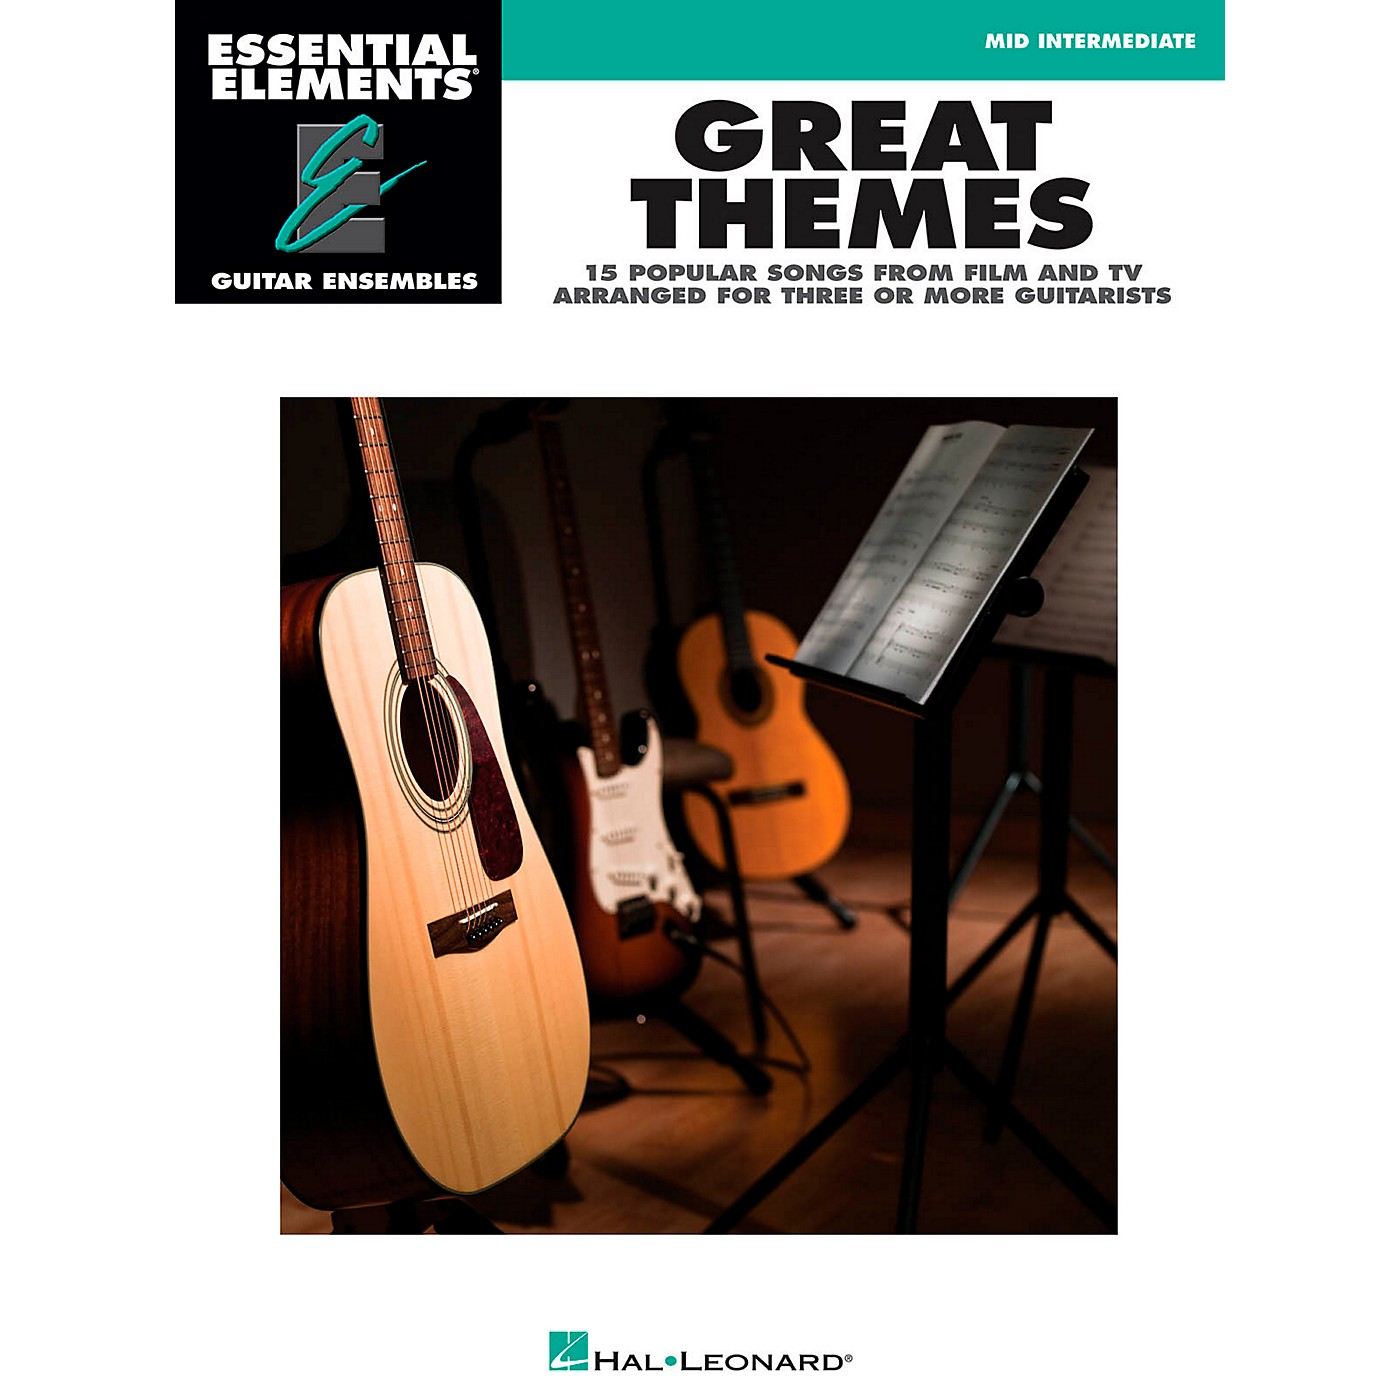 Hal Leonard Great Themes - Essential Elements Guitar Ensembles Songbook thumbnail